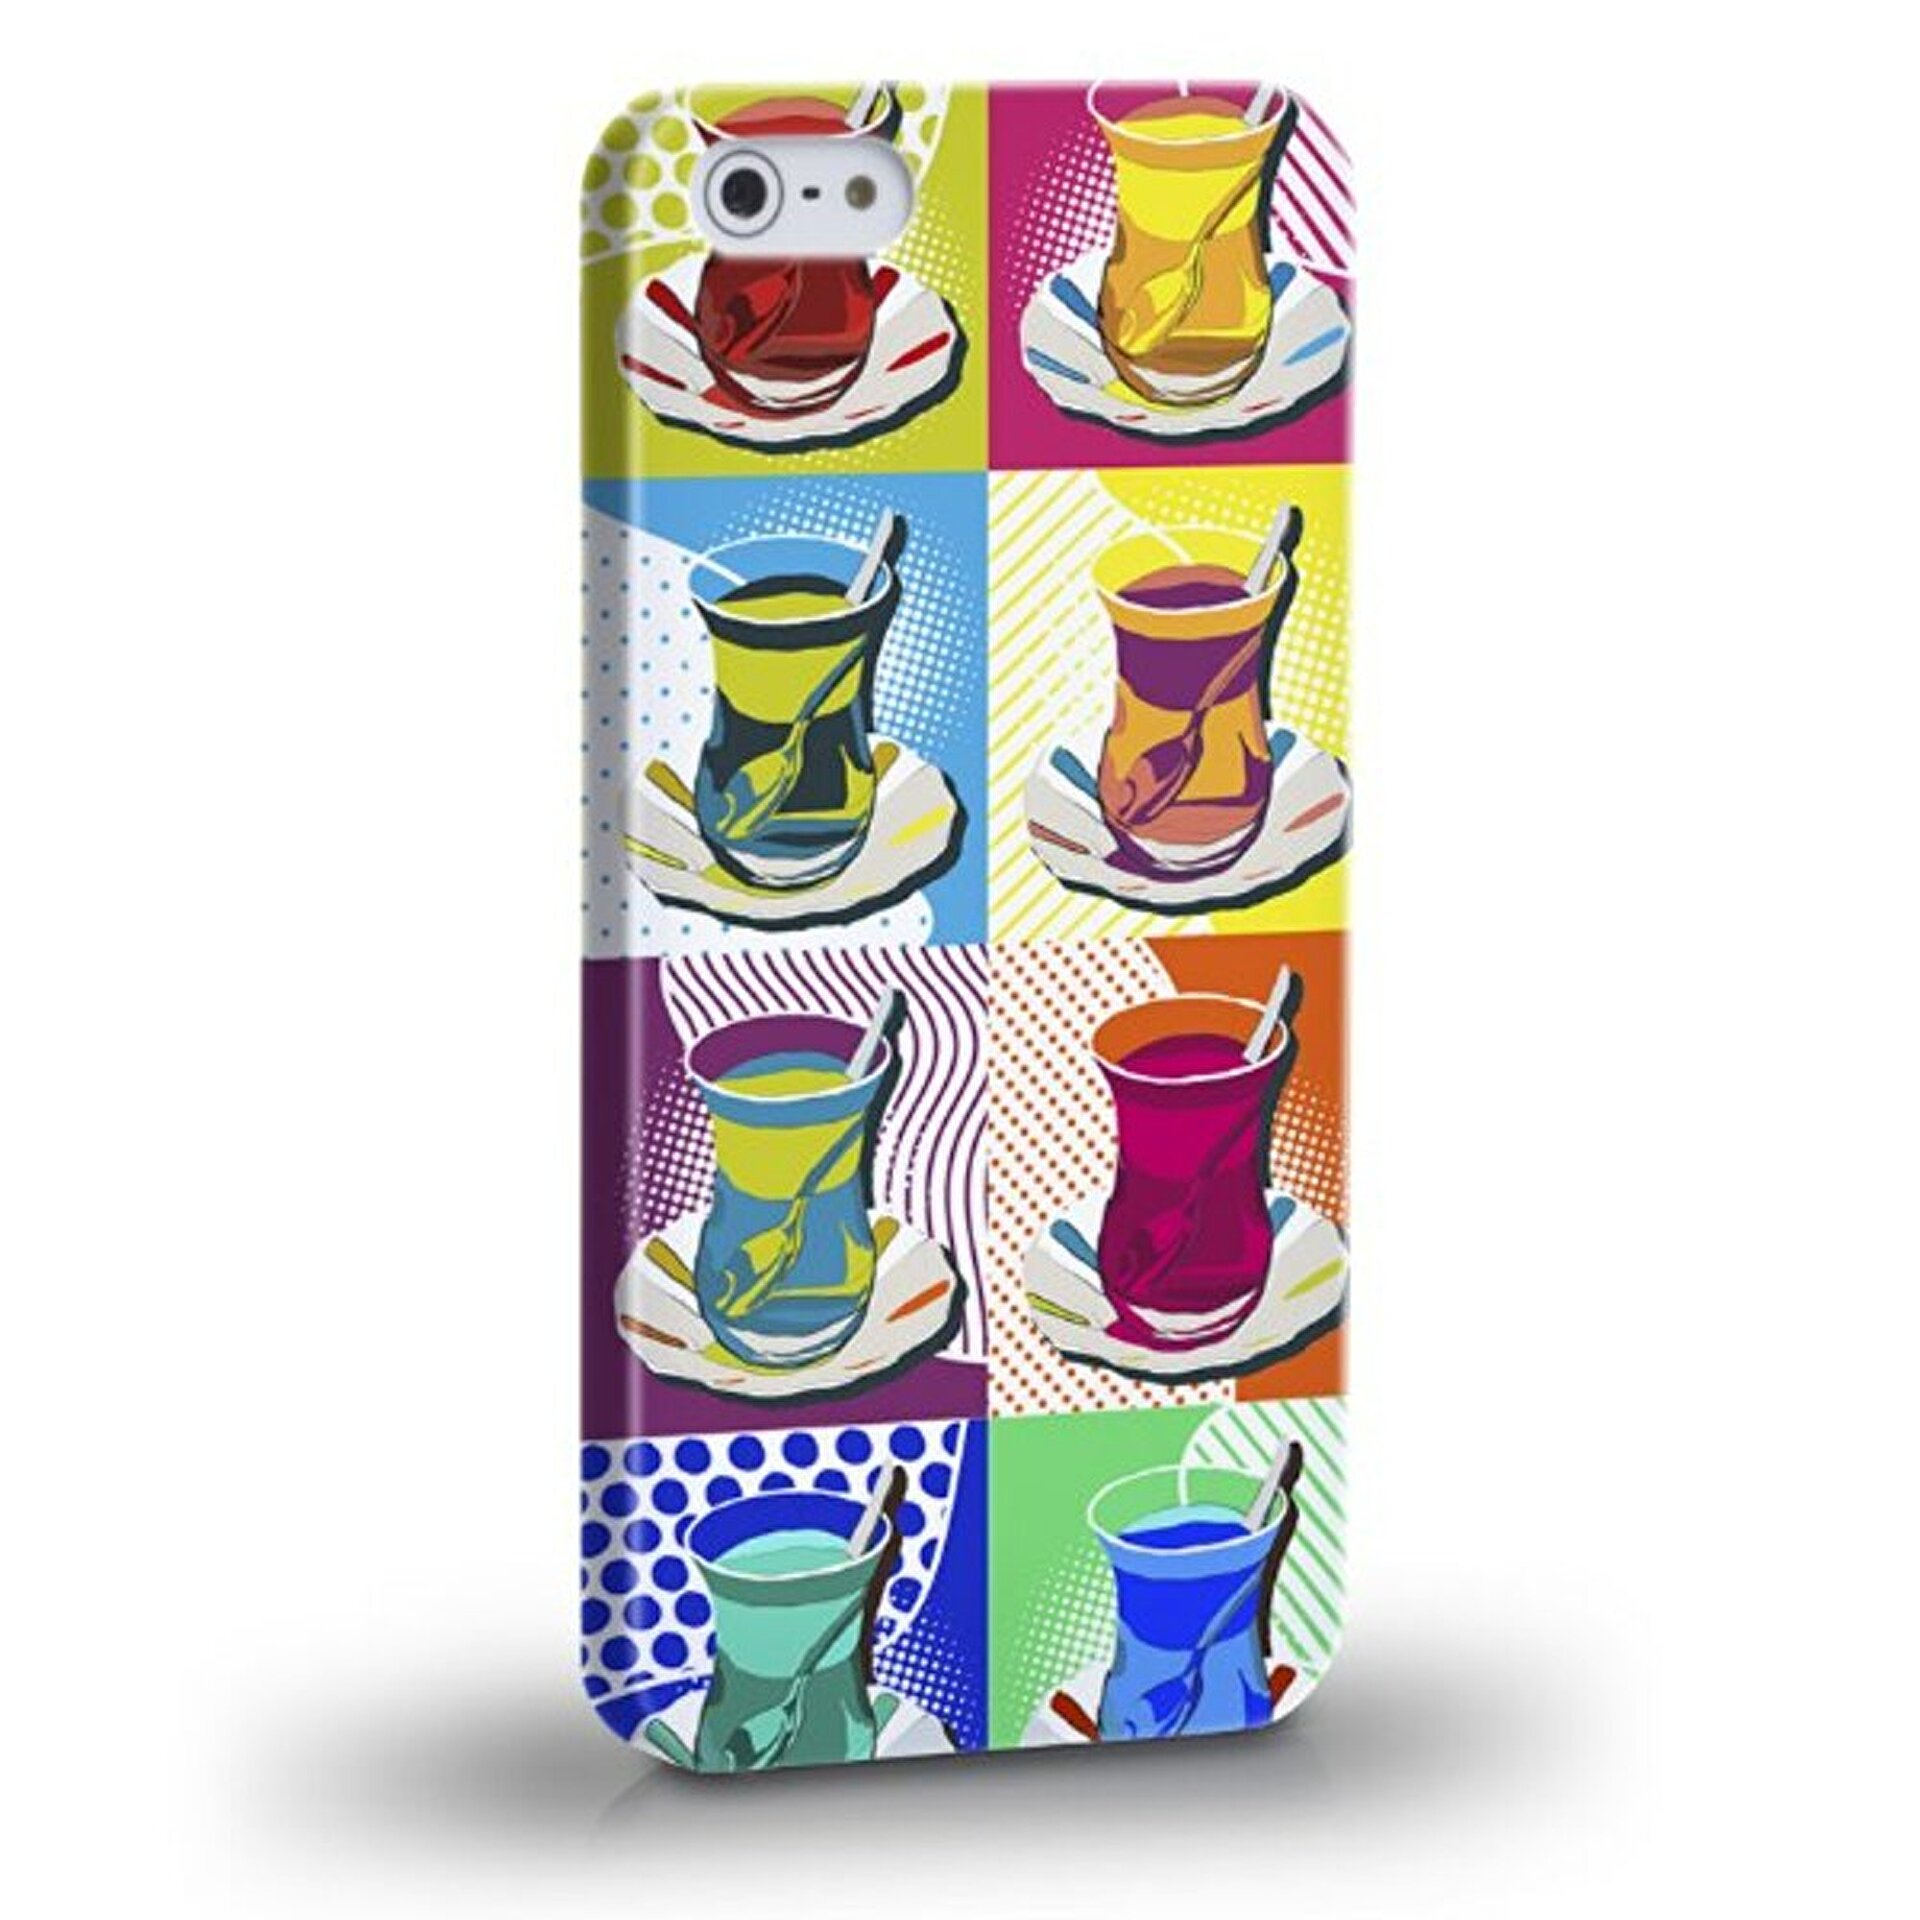 Picture of Biggdesign Çay Bardağı iPhone Kapak